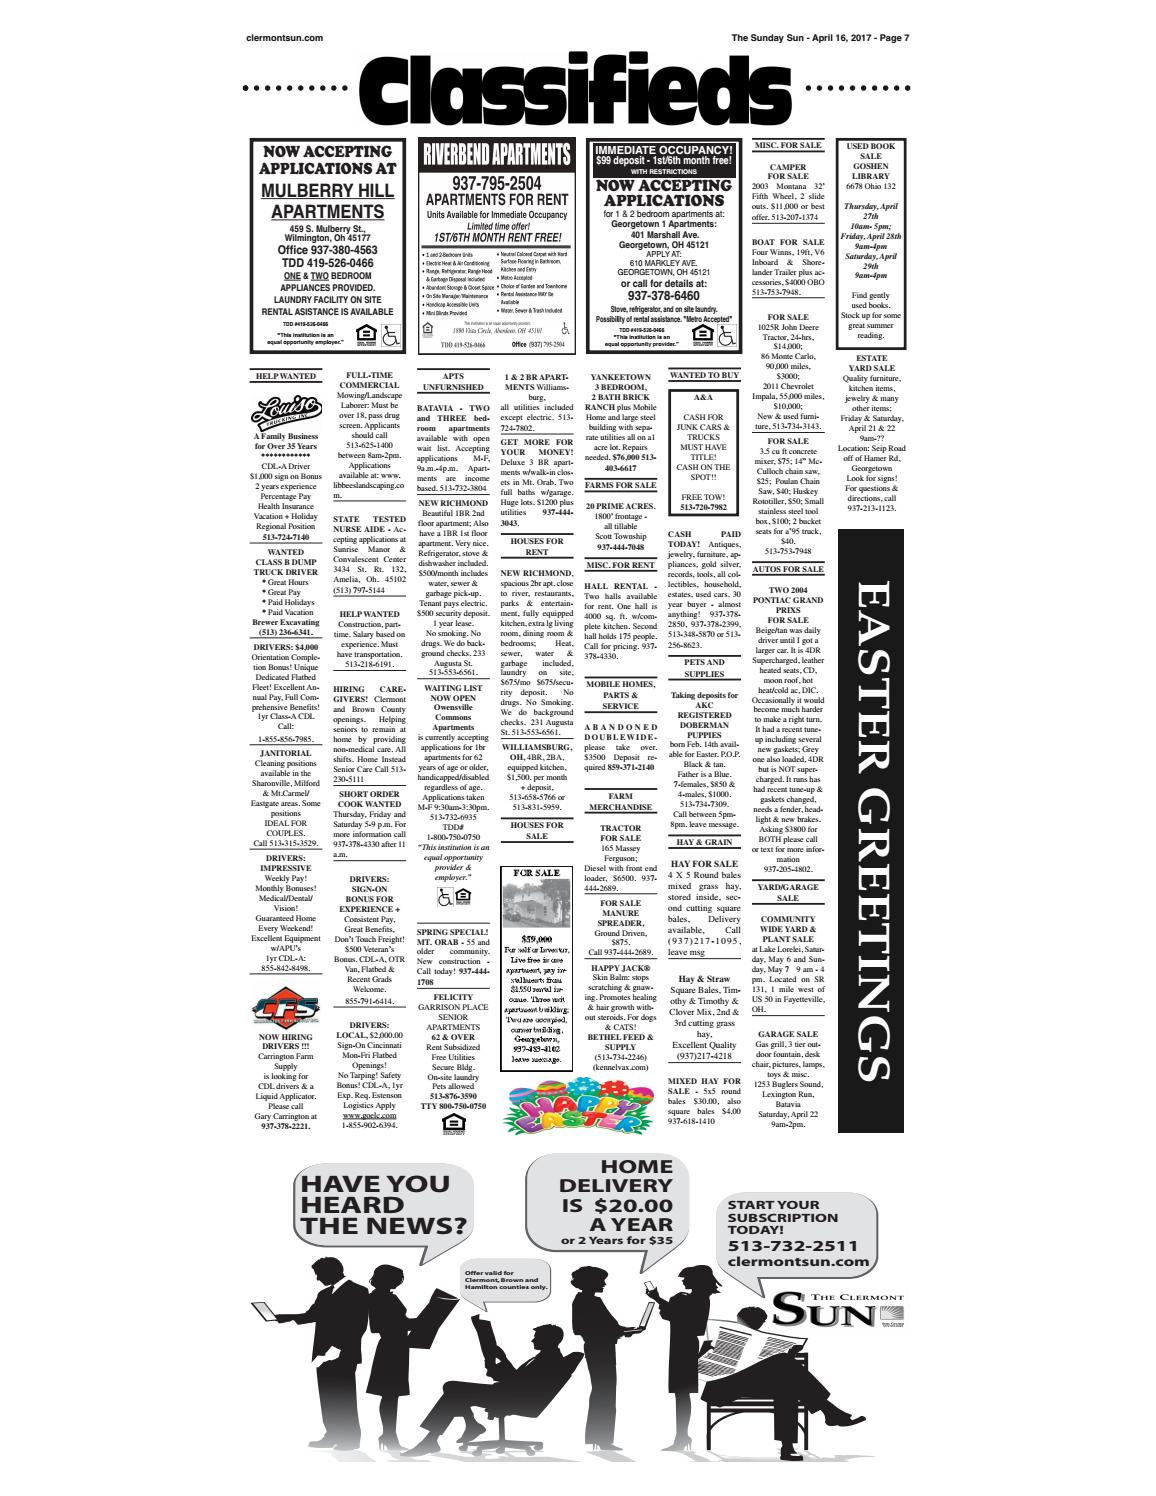 Clermont Sun Classifieds - April 13, 2017 by Clermont Sun Publishing